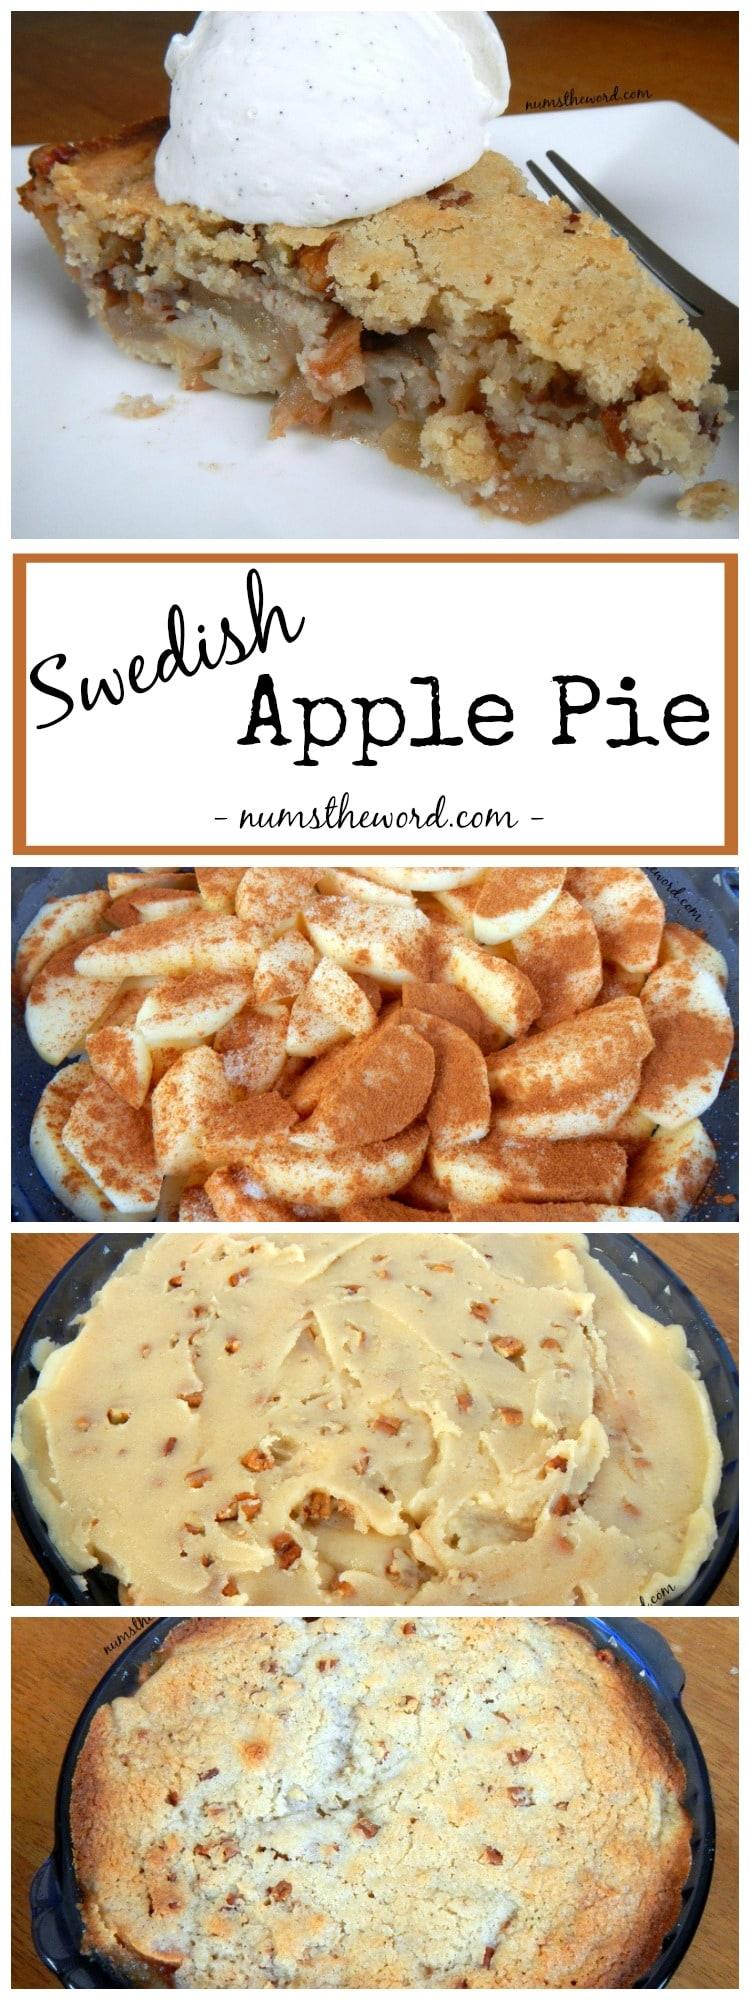 Swedish Apple Pie